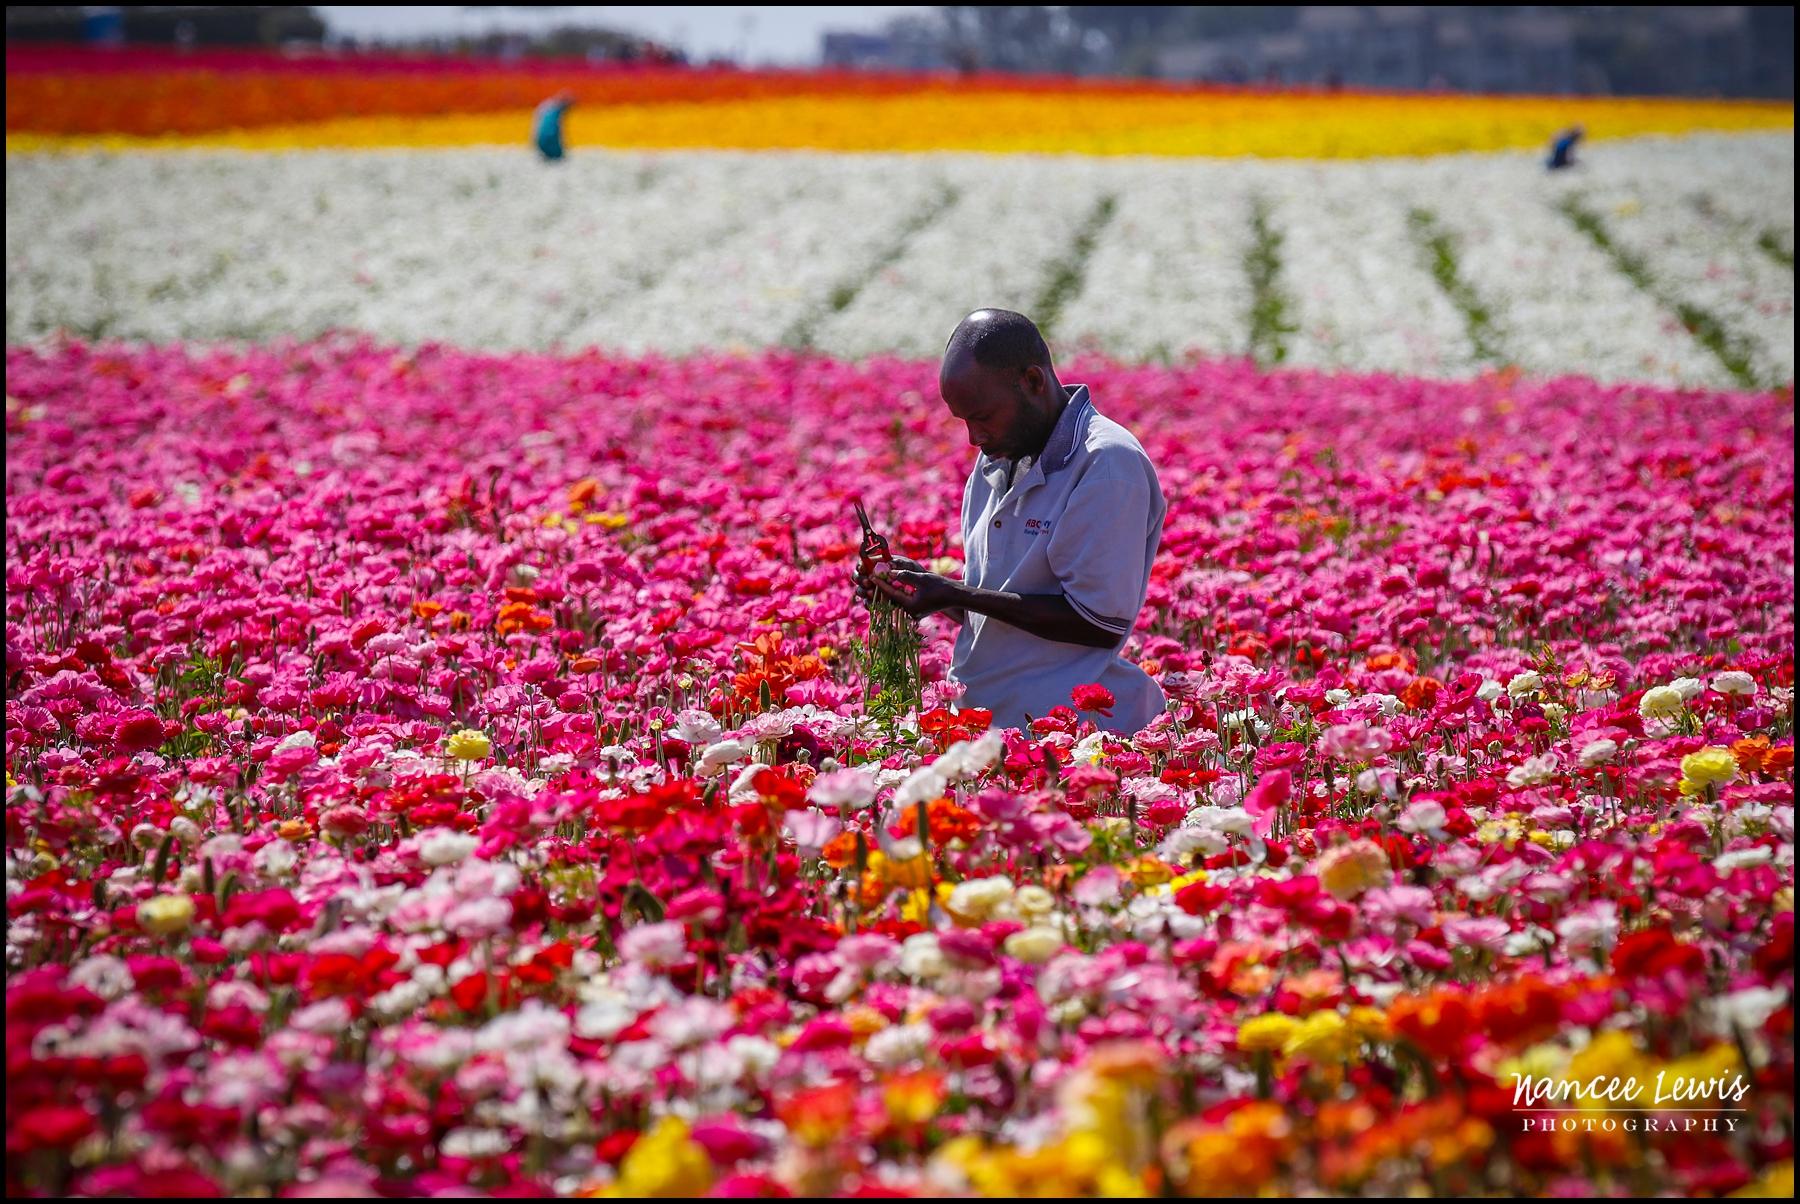 Carlsbad Flower Fields | Nancee Lewis Photography